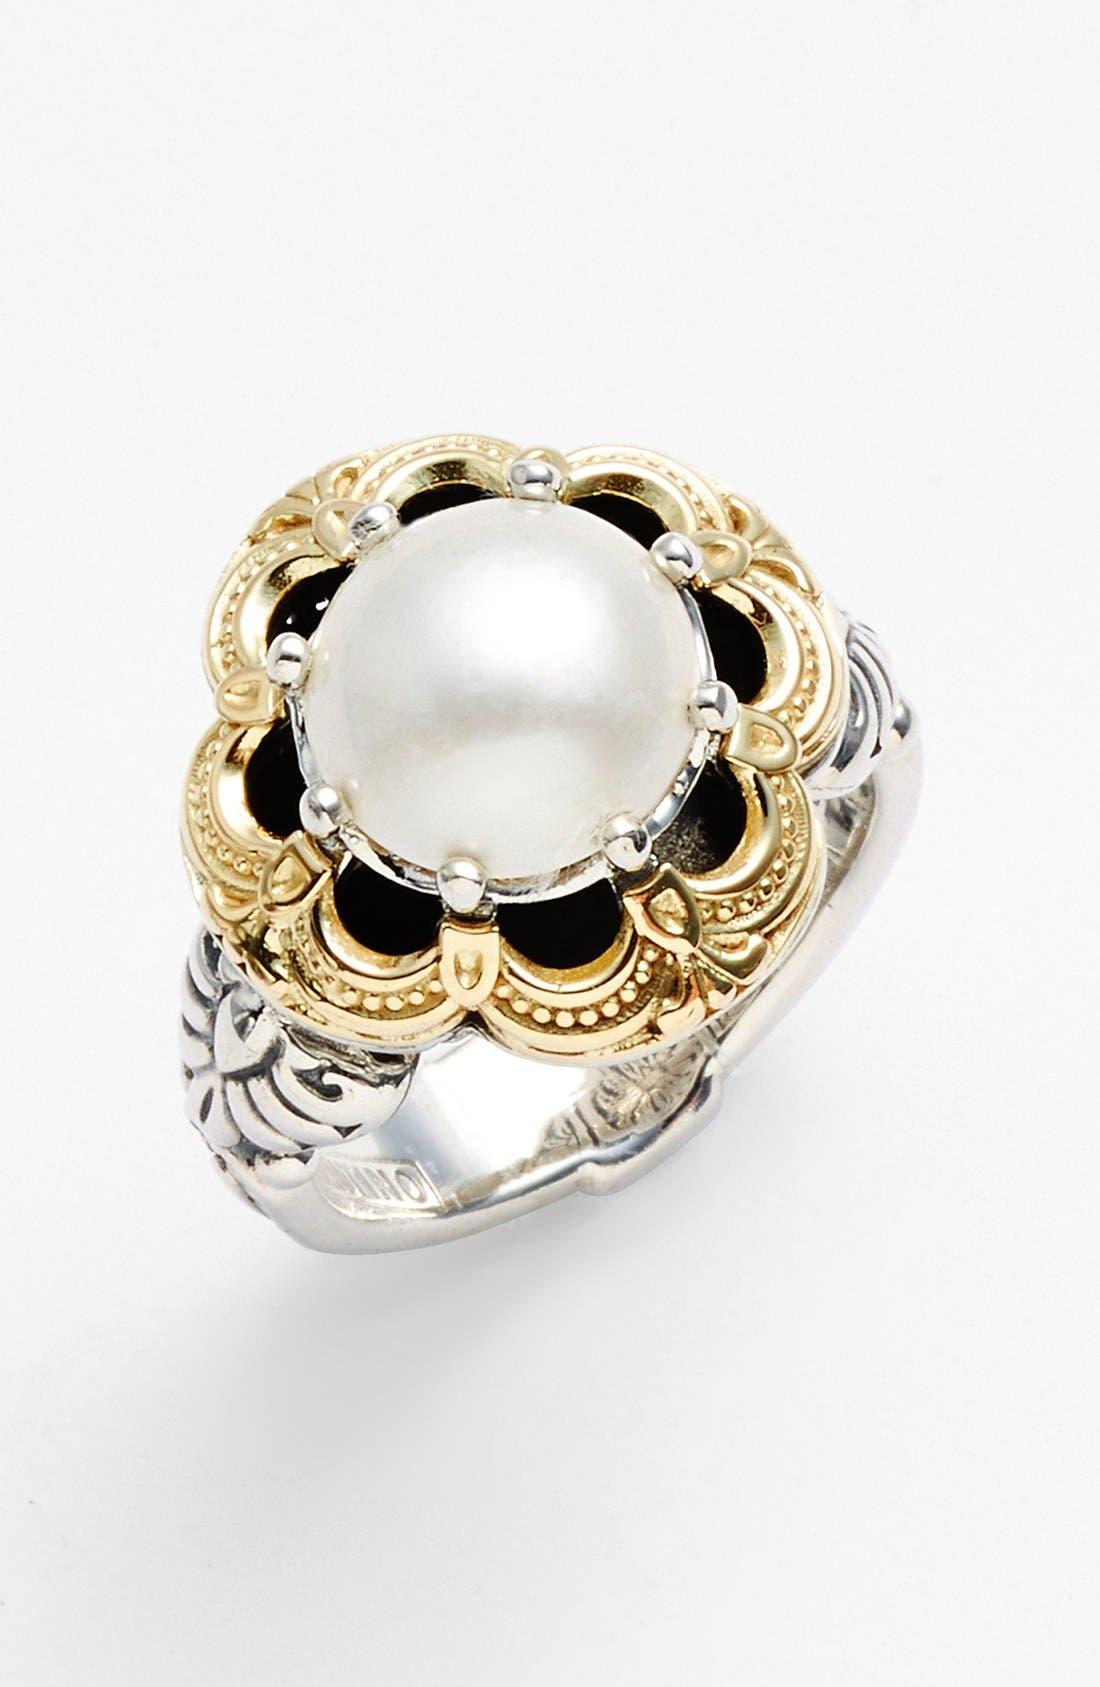 'Hermione' Semiprecious Stone Ring,                             Main thumbnail 1, color,                             Silver/ Gold